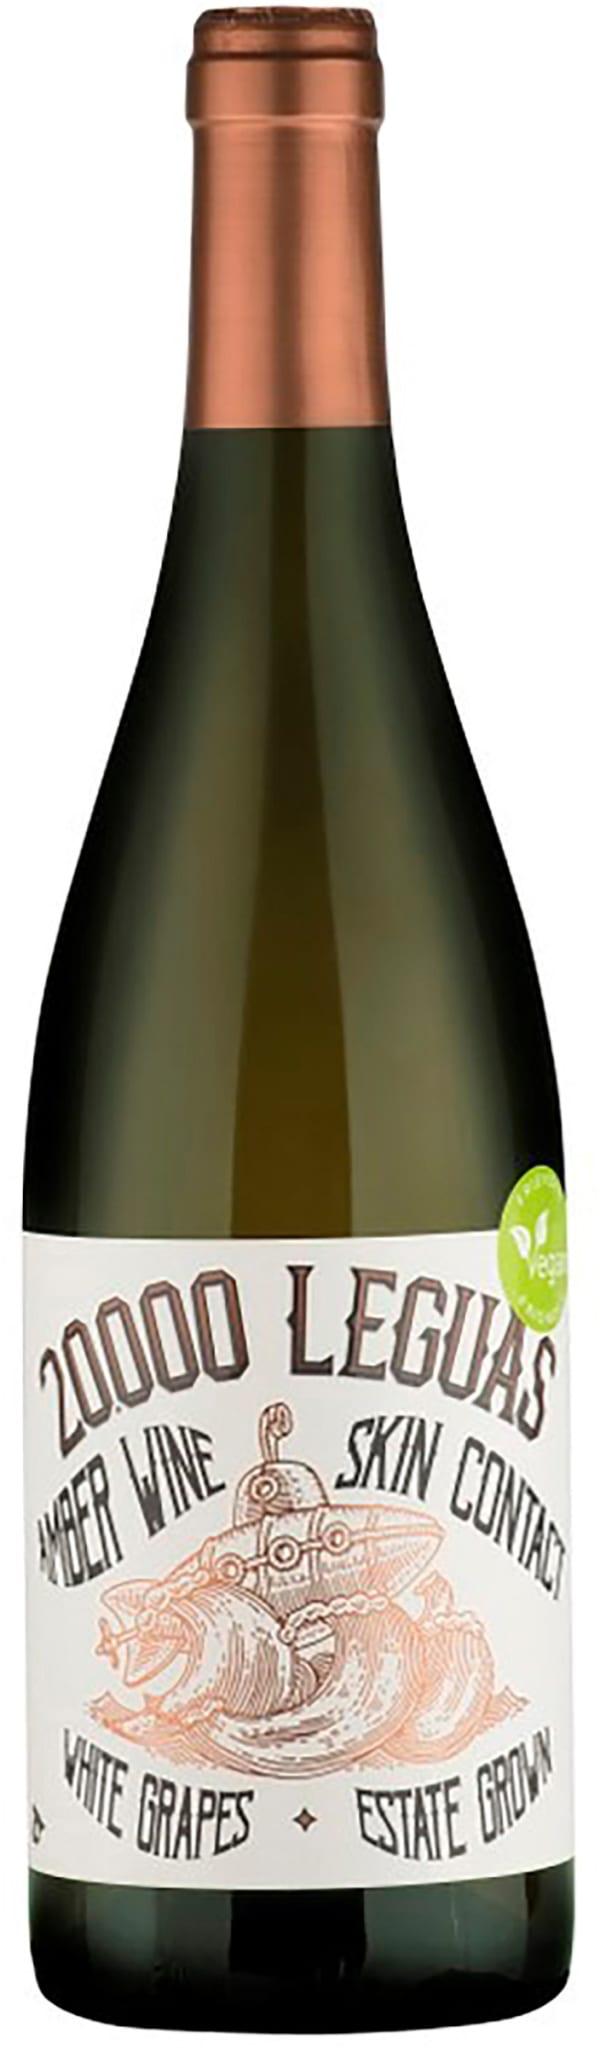 20.000 Leguas Amber Wine 2017